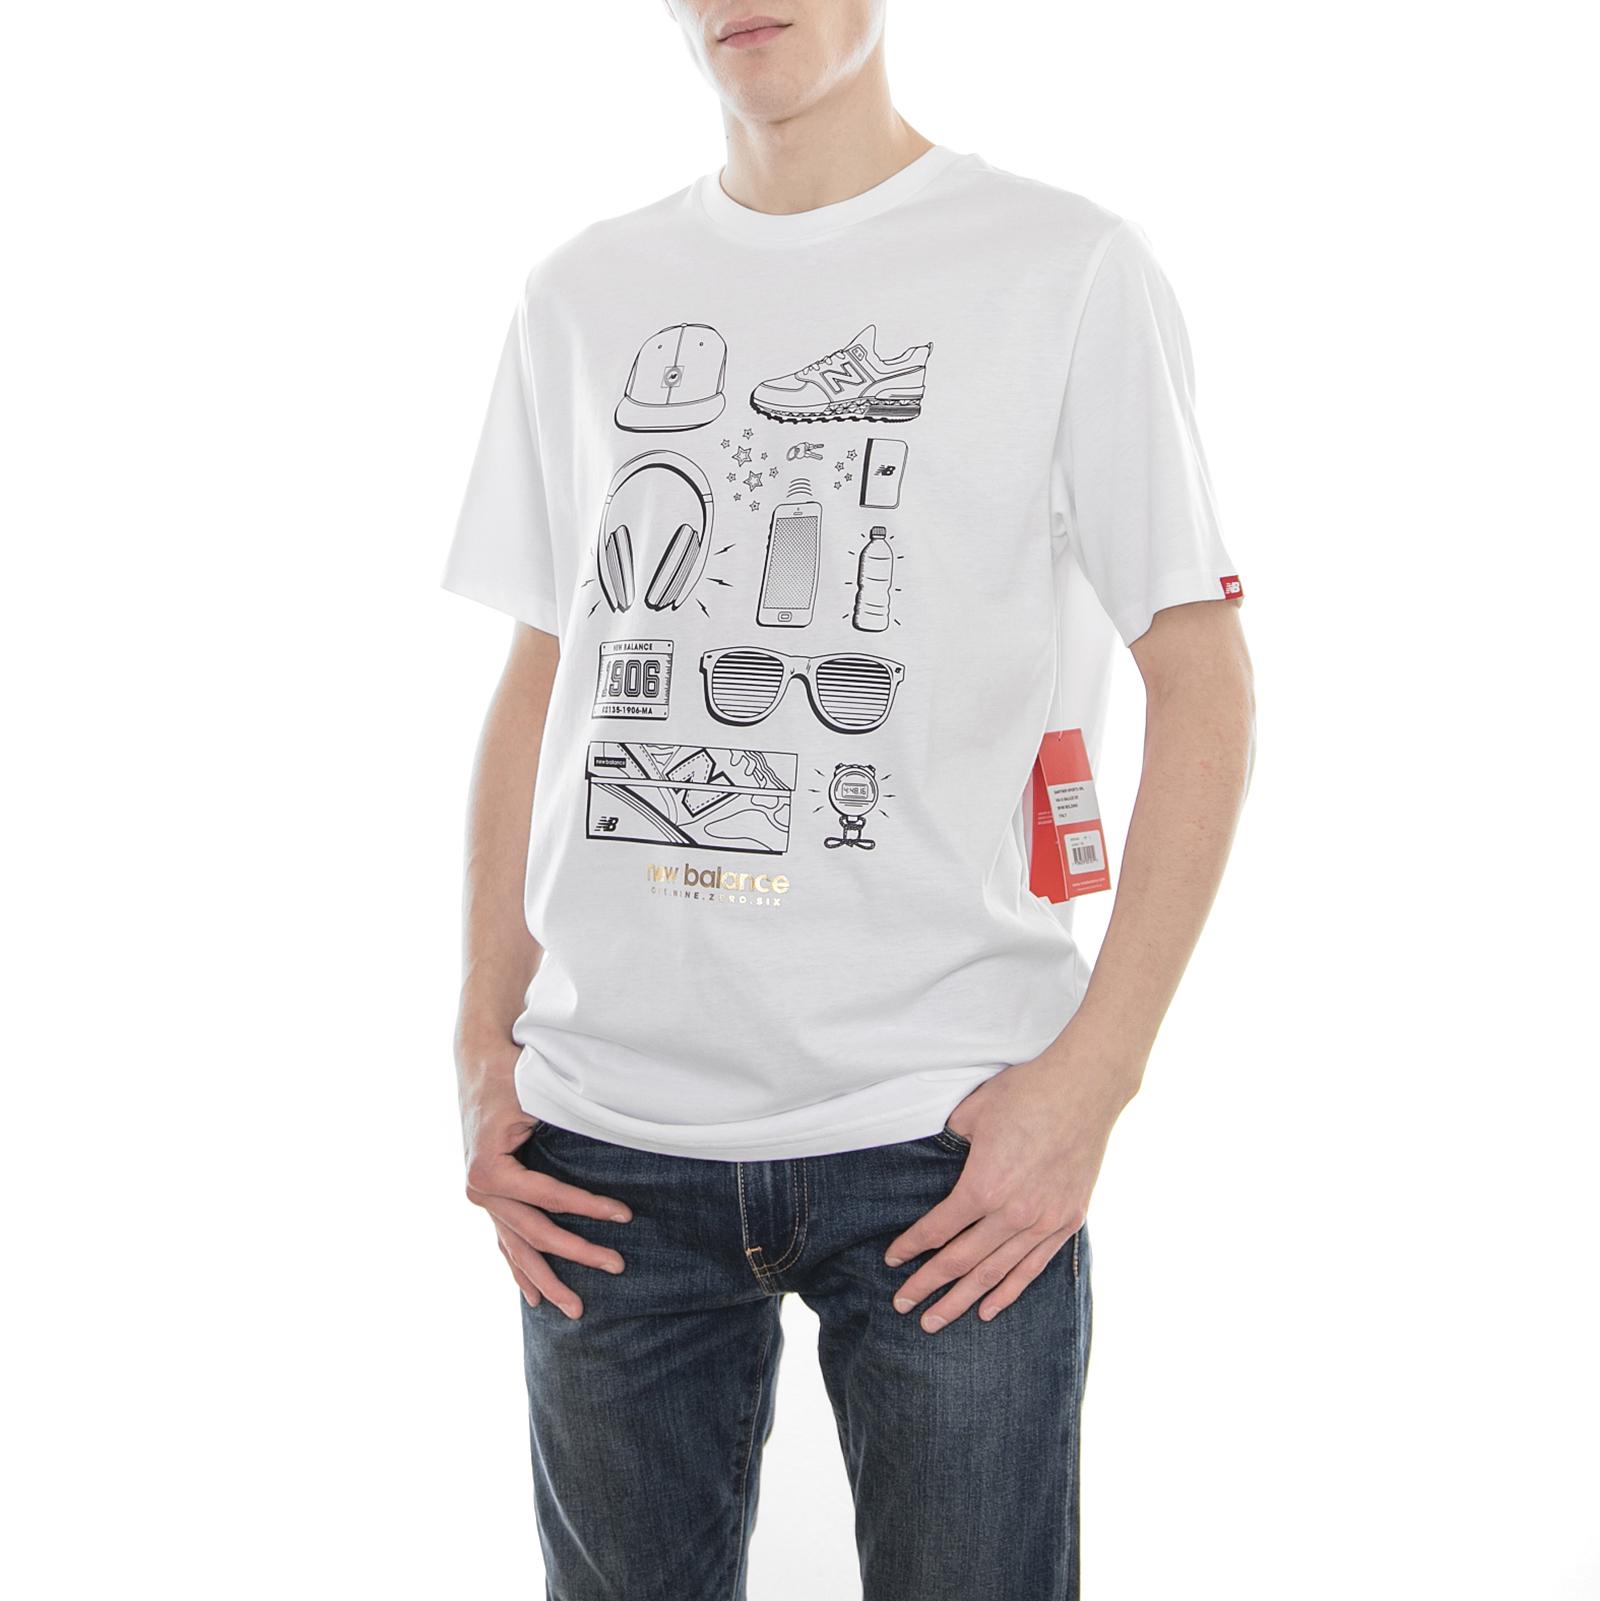 new balance t shirt